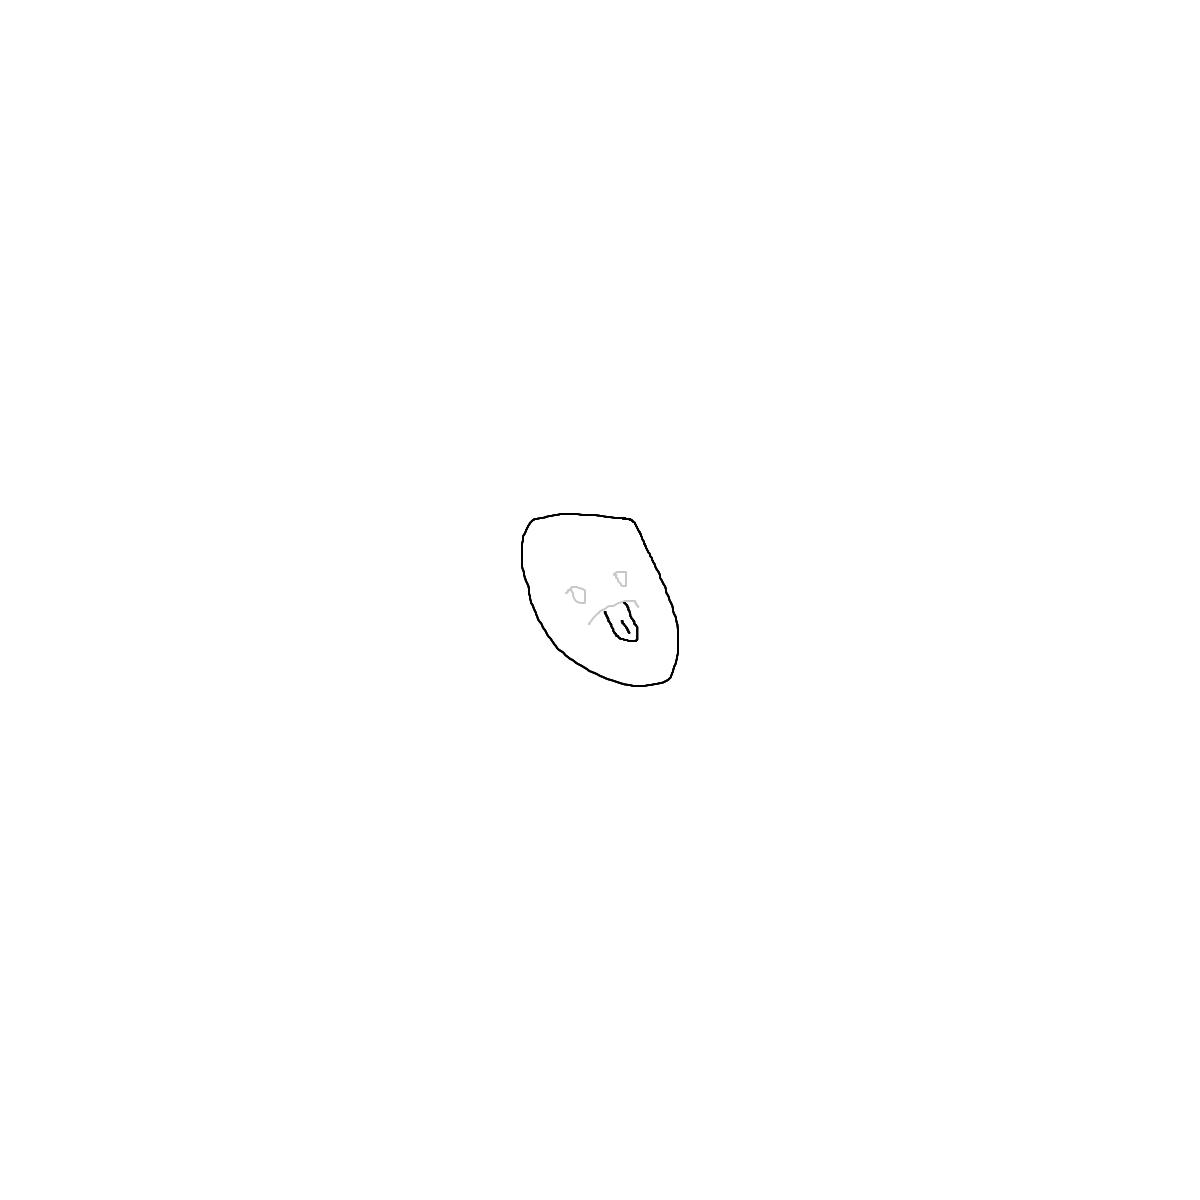 BAAAM drawing#16353 lat:52.4702224731445300lng: 13.3957862854003900